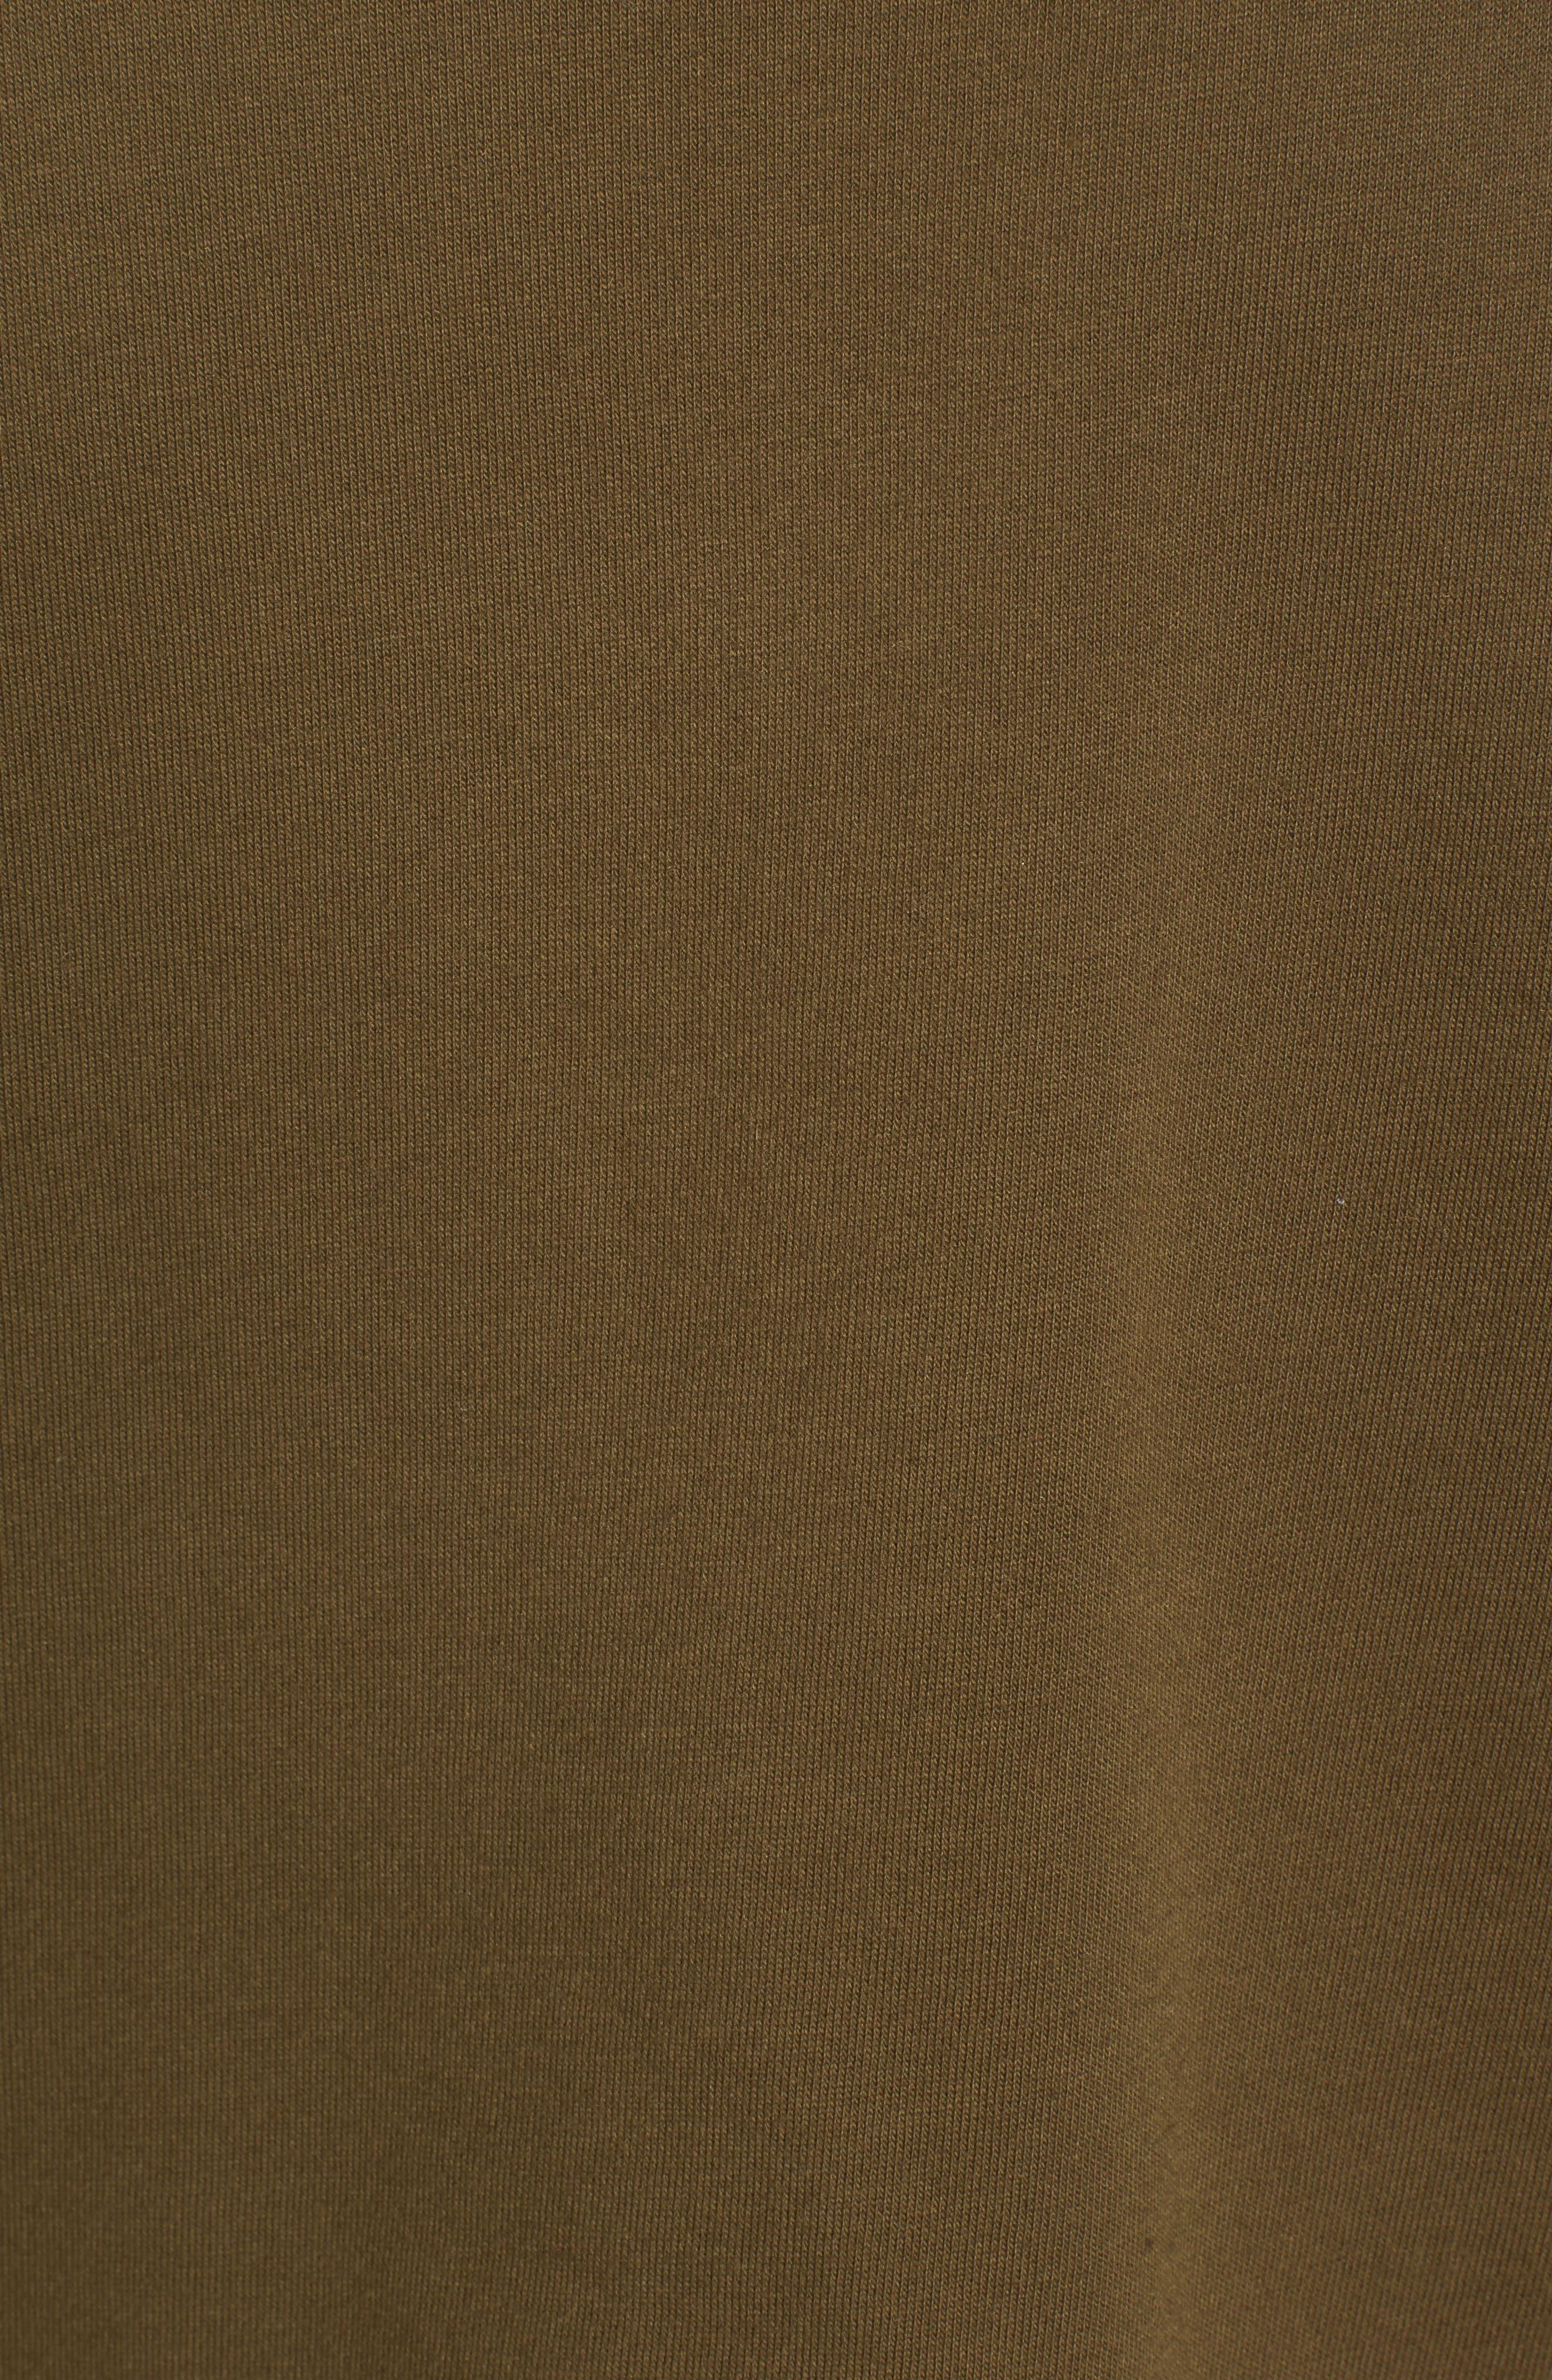 Pleat Sleeve Sweater,                             Alternate thumbnail 5, color,                             Olive Dark